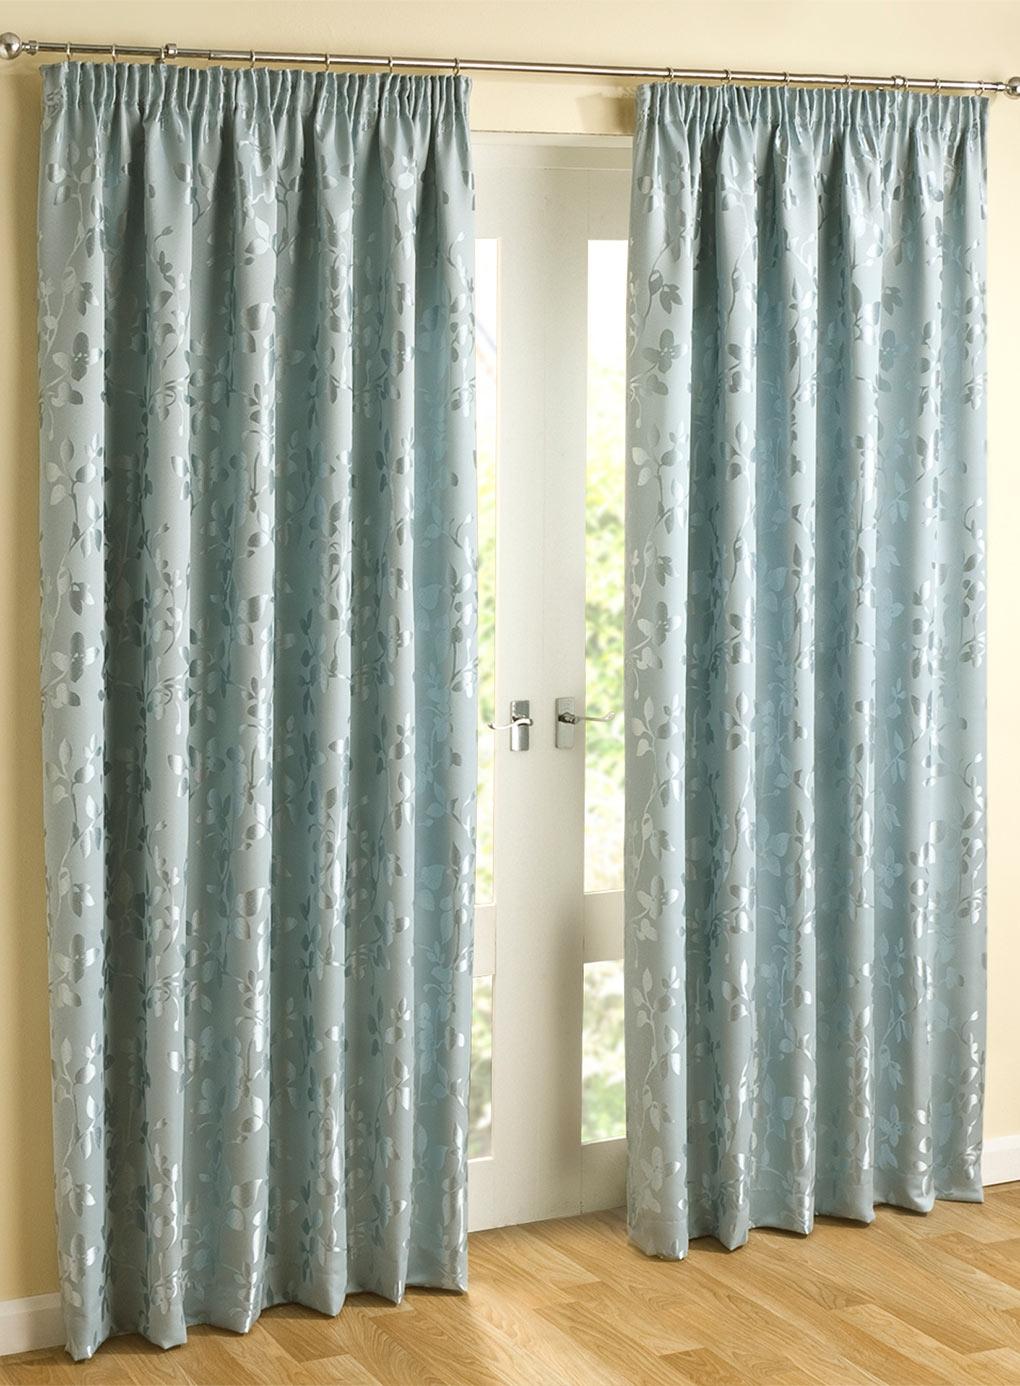 Alice Pencil Pleat Curtain Duck Egg Curtains Accessories With Pencil Pleat Curtains (Image 1 of 15)